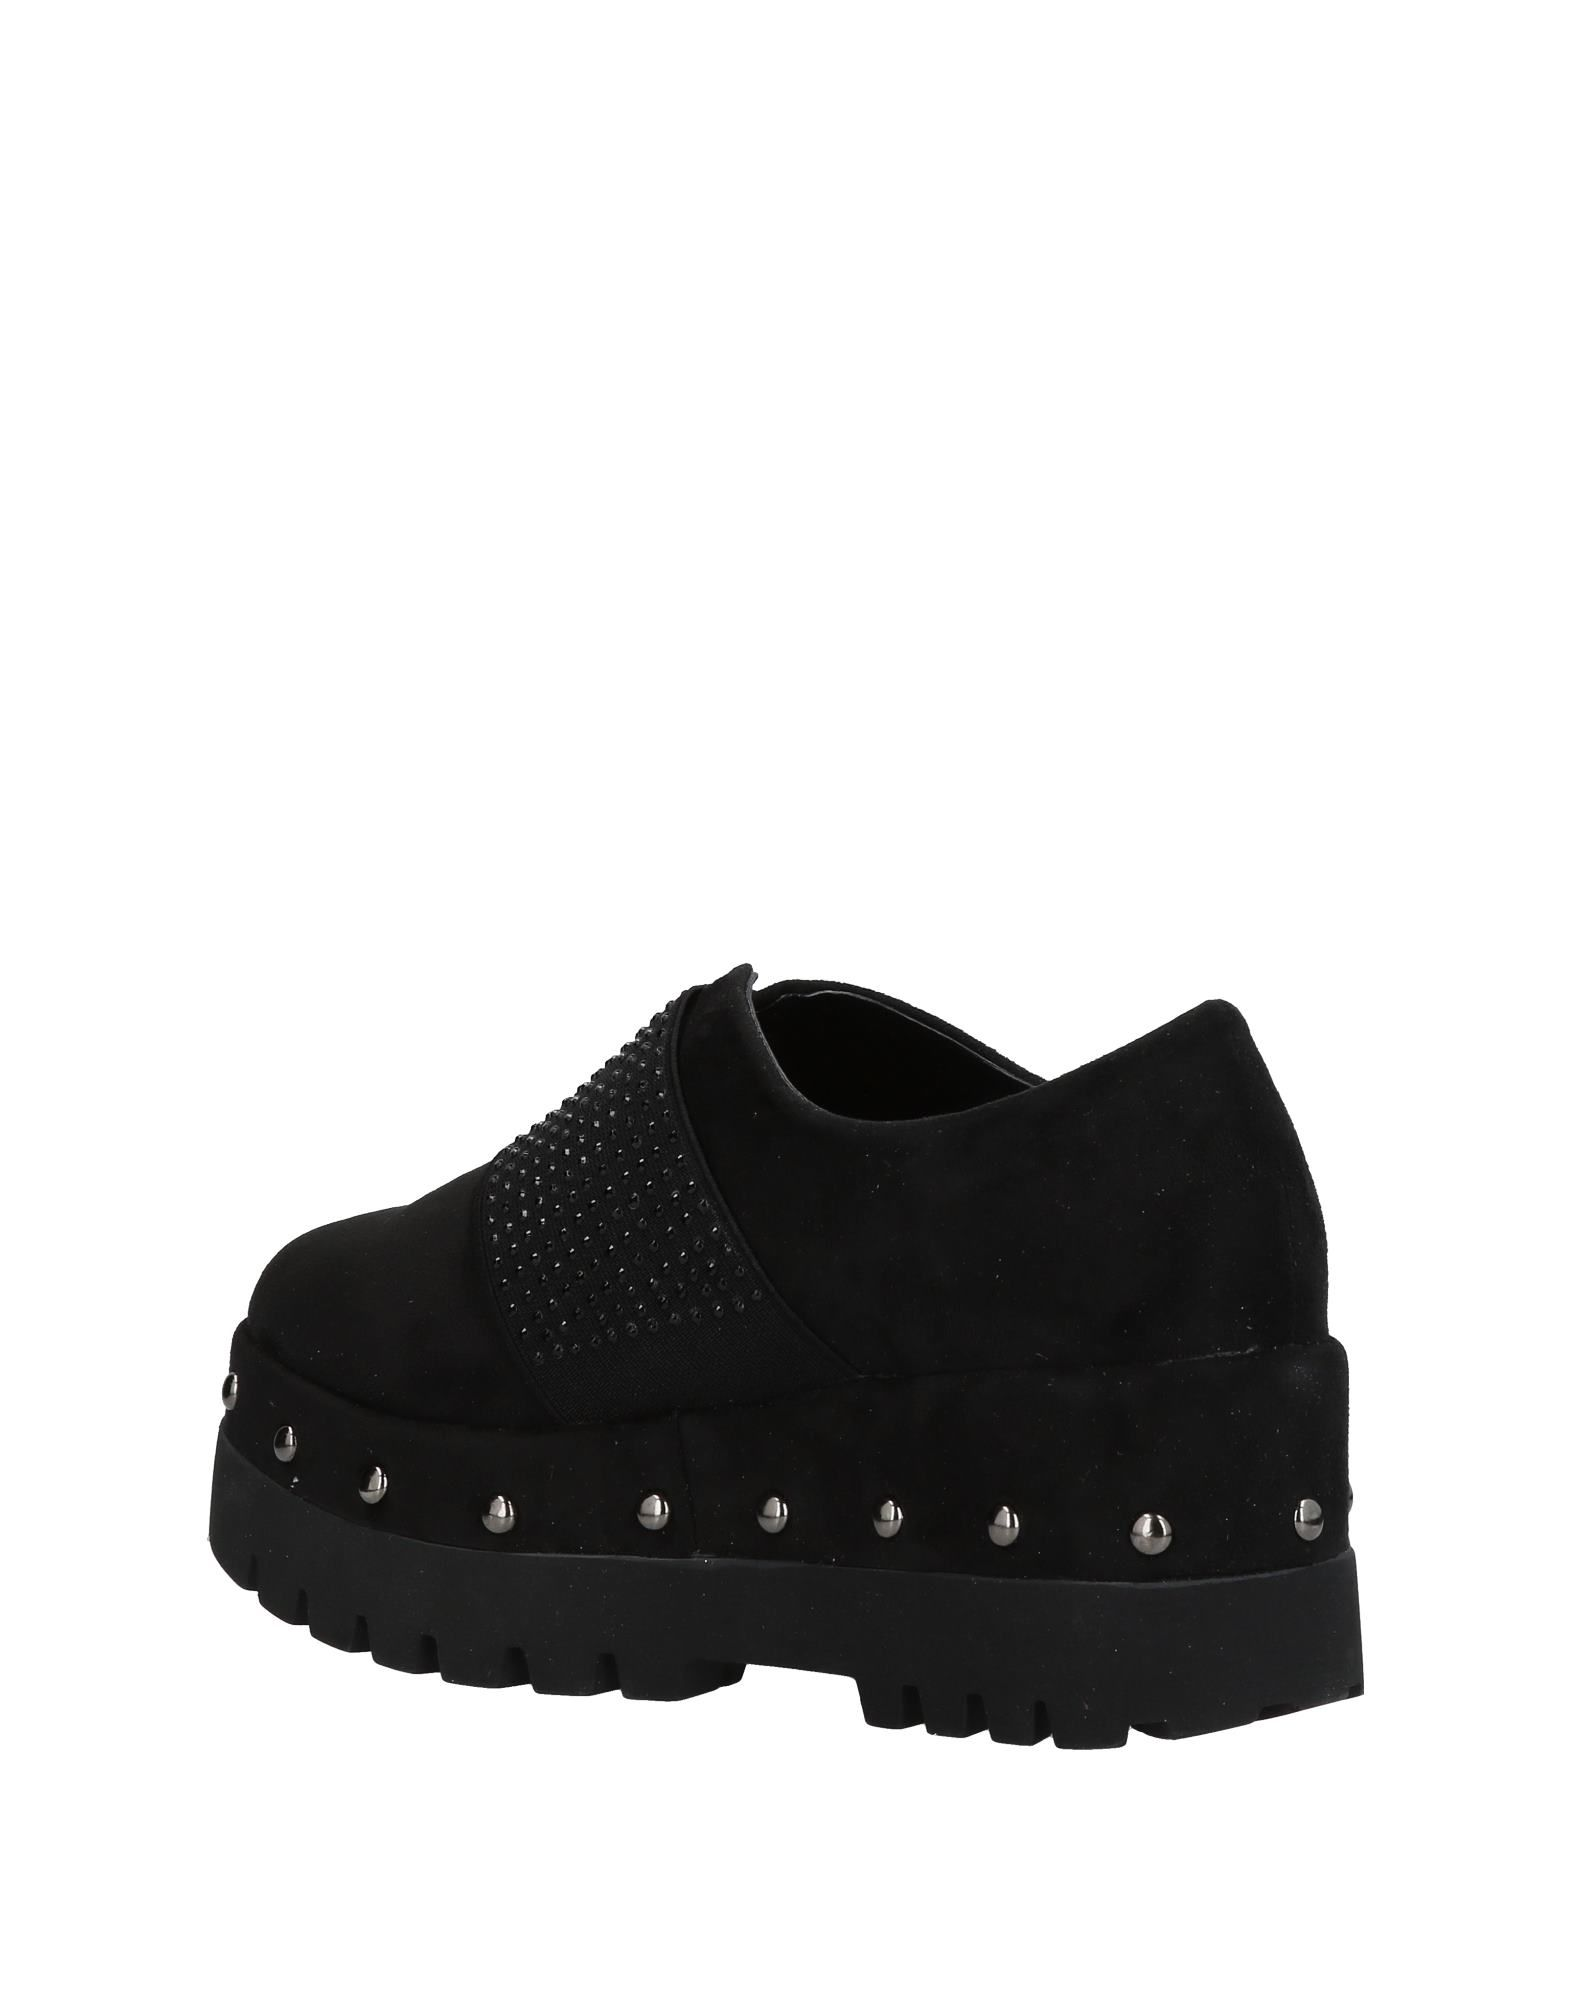 Tua By Braccialini Sneakers Damen  11448753XC Gute Qualität beliebte Schuhe